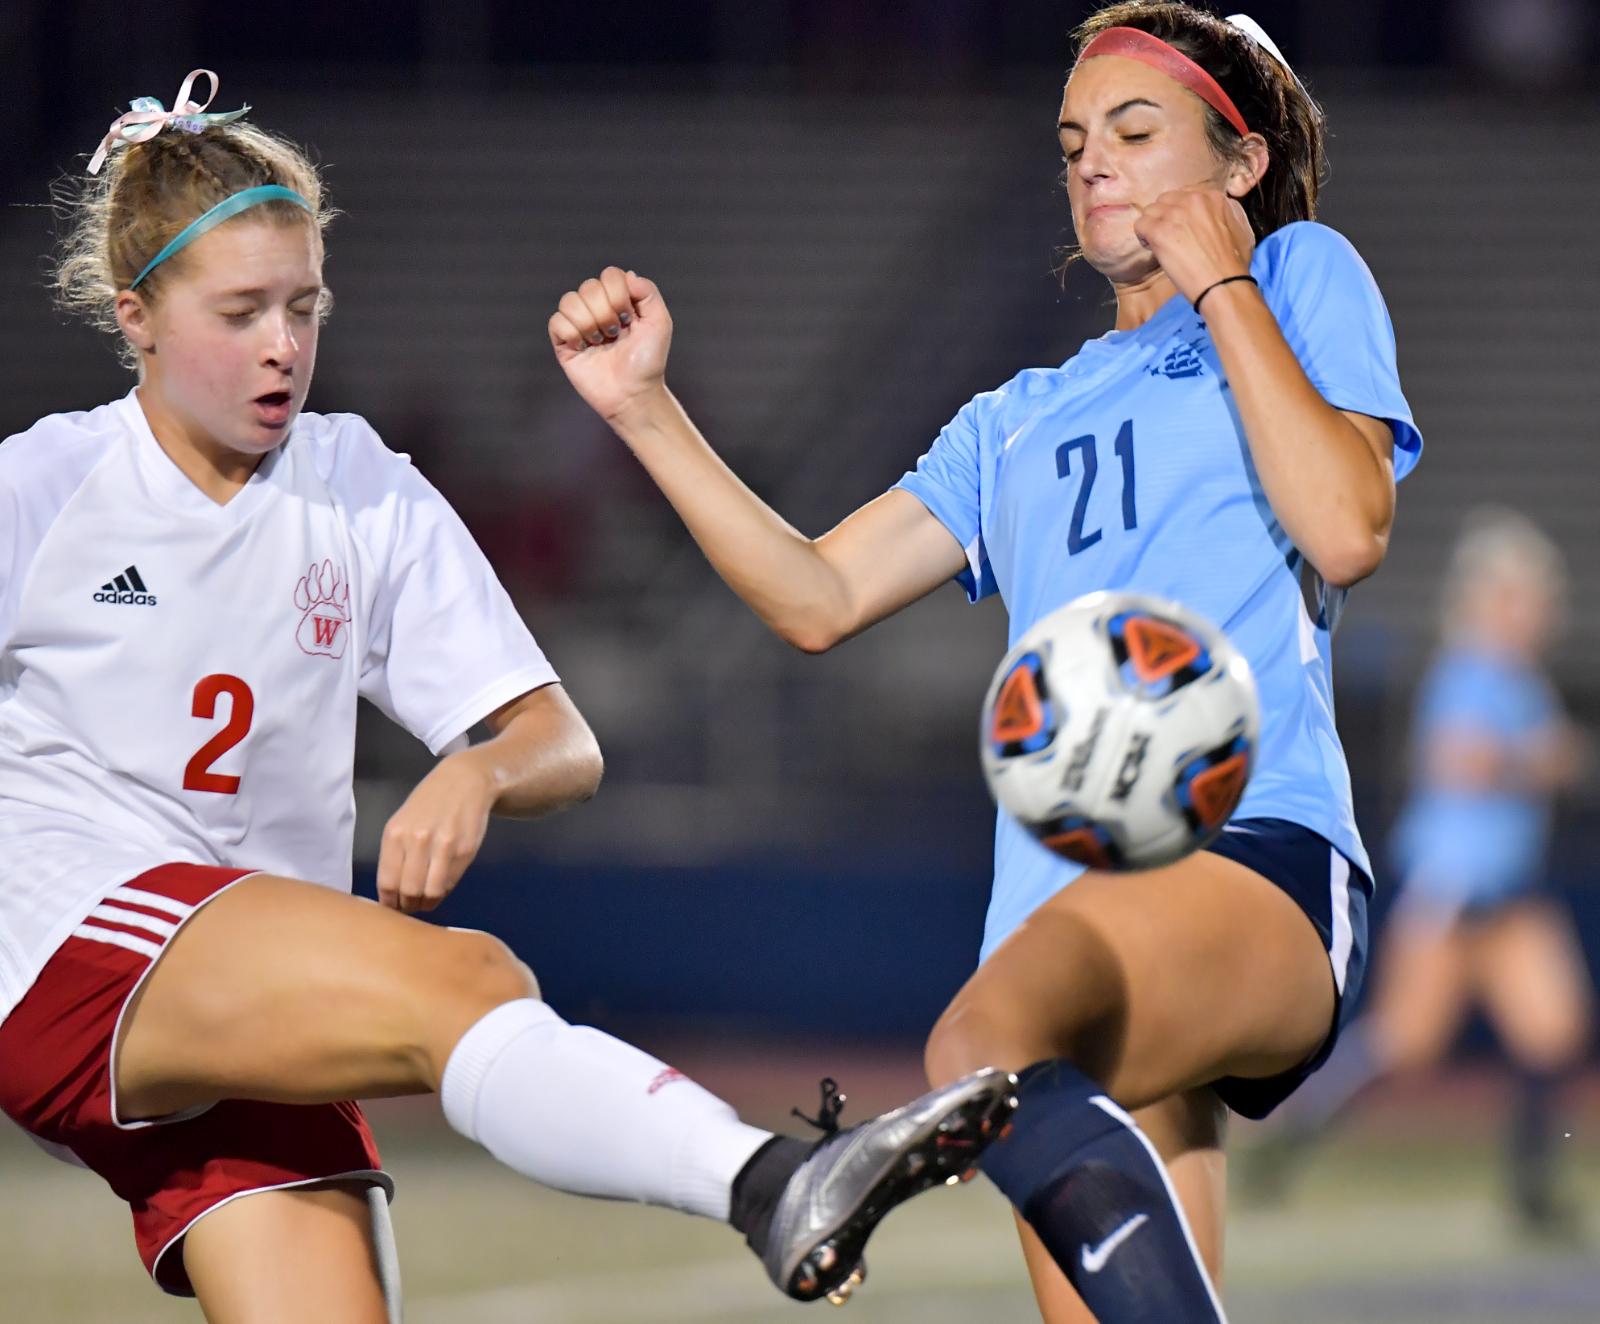 Images From Hudson Girls Soccer vs Wadsworth